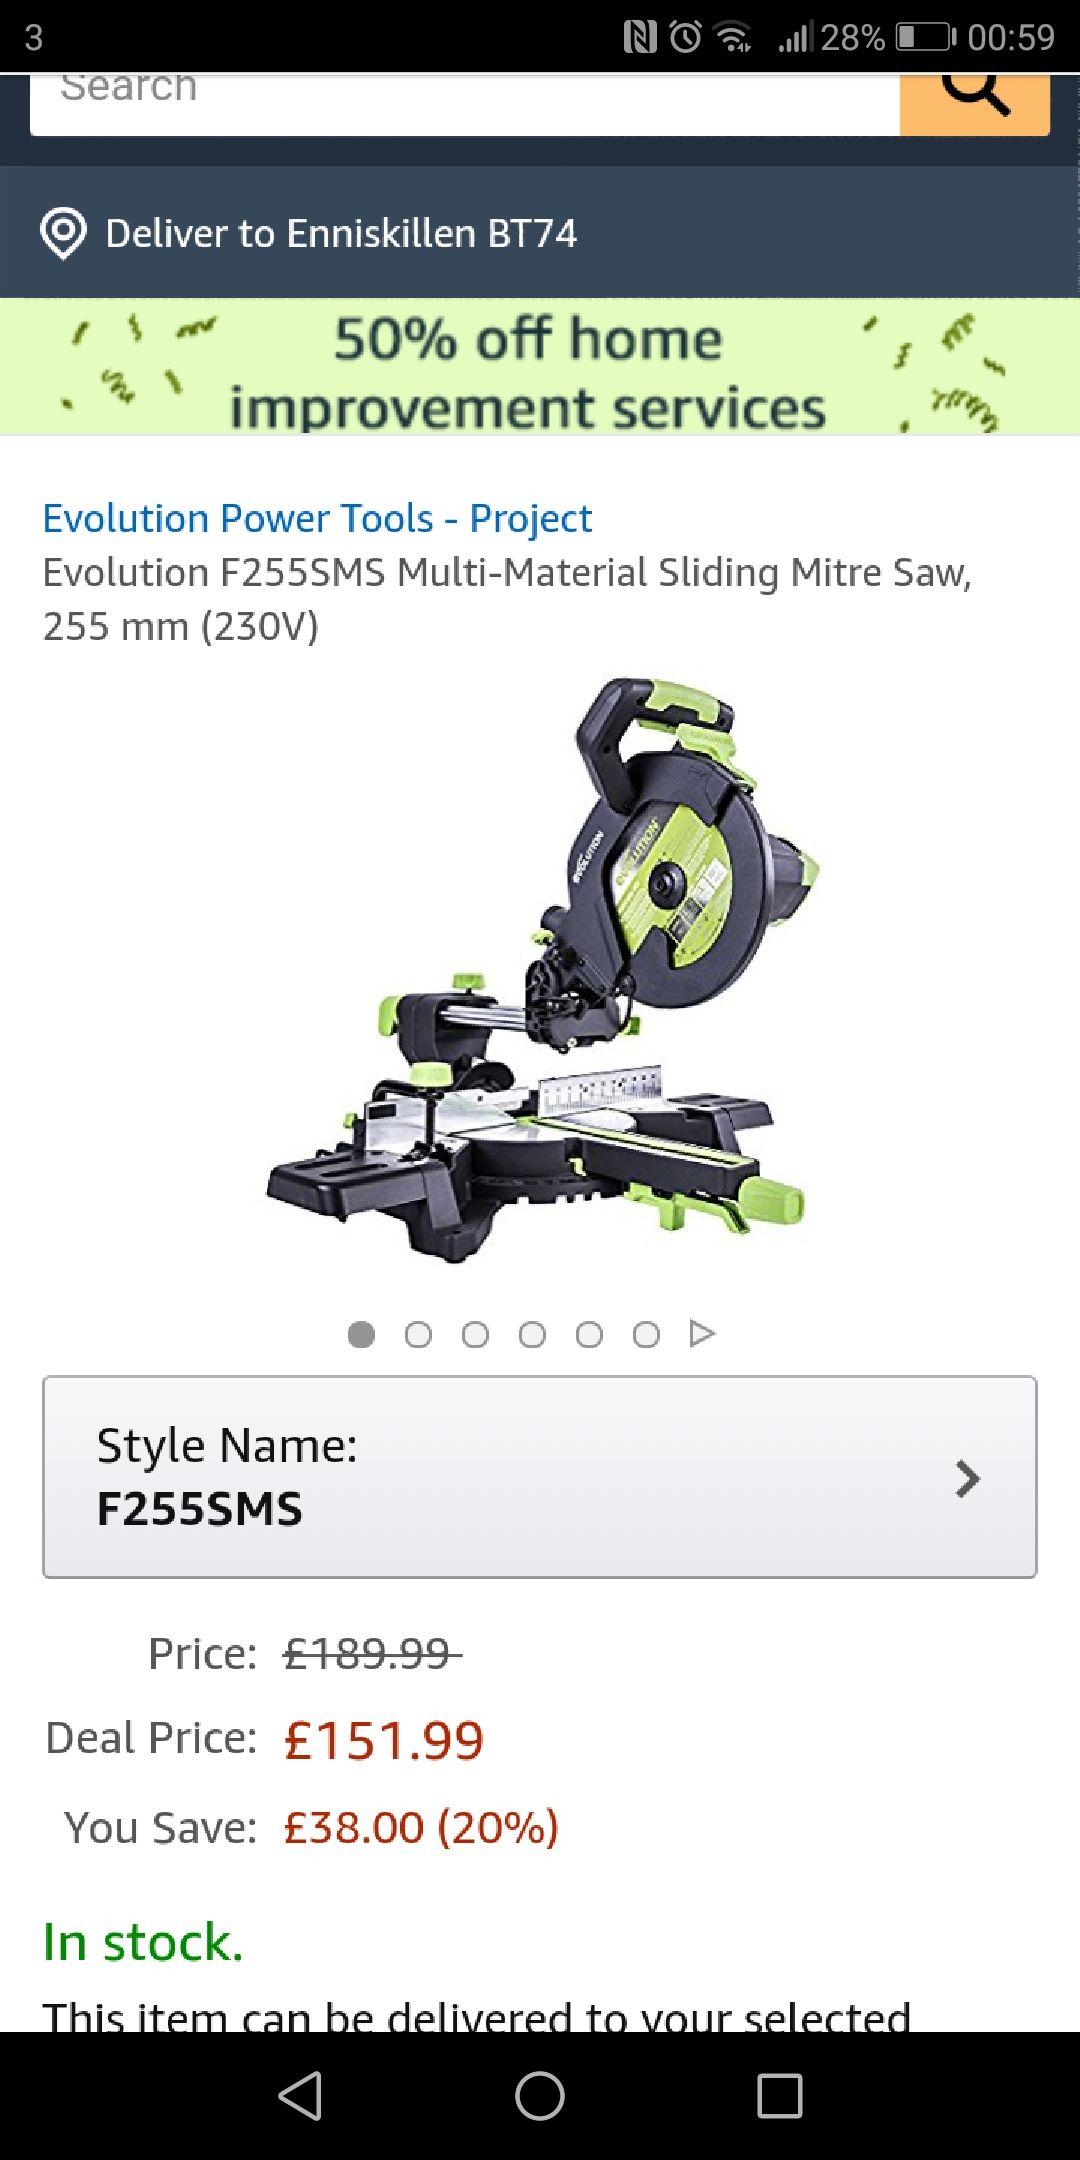 Amazon Deal Evolution F255SMS Multi-Material Sliding Mitre Saw, 255 mm (230V) £151.99 Amazon Lightning deal